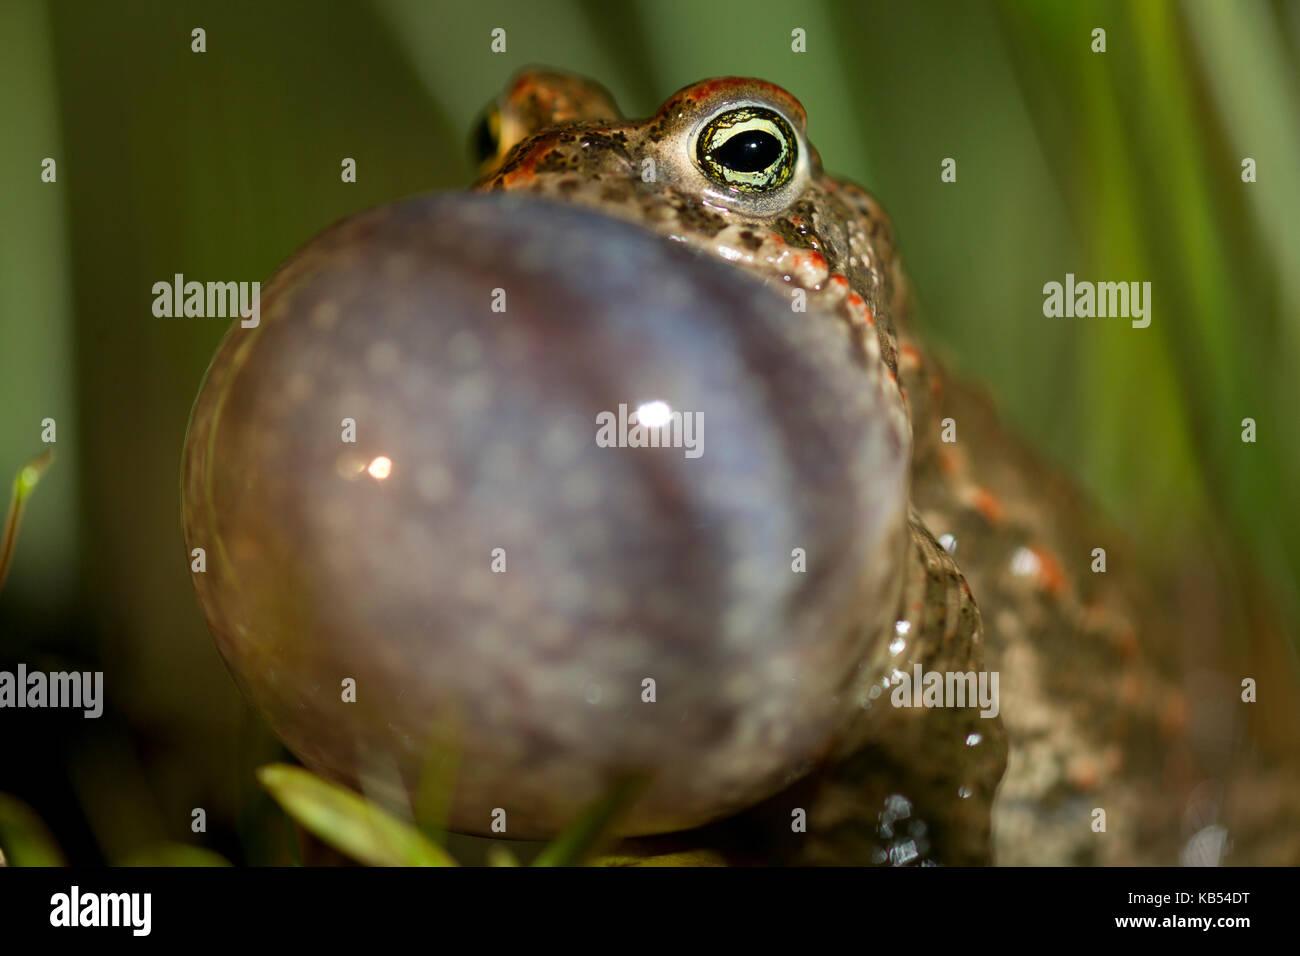 Natterjack Toad (Epidalea calamita) portrait, croaking, The Netherlands - Stock Image